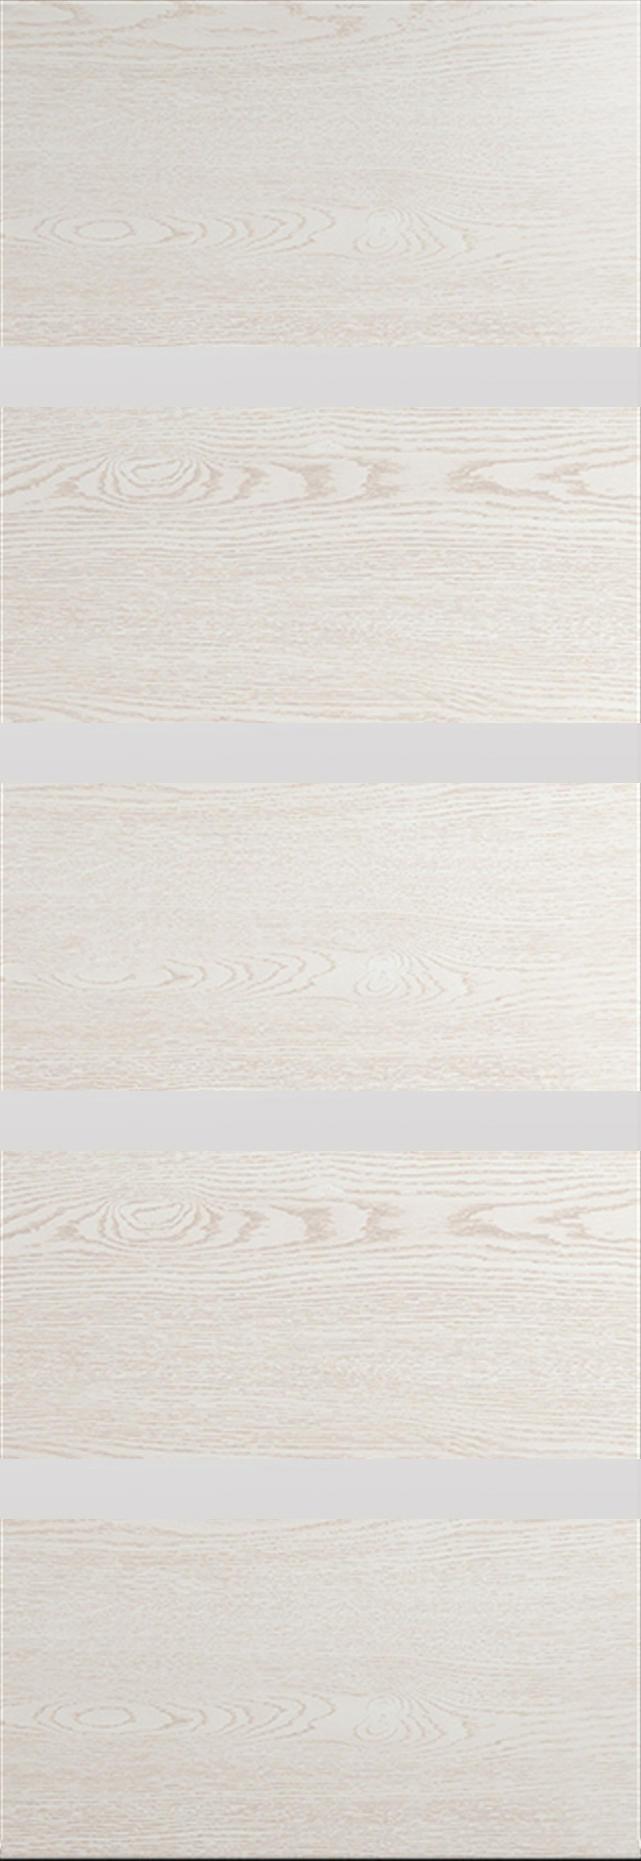 Tivoli Д-4 Invisible цвет - Белый ясень Без стекла (ДГ)